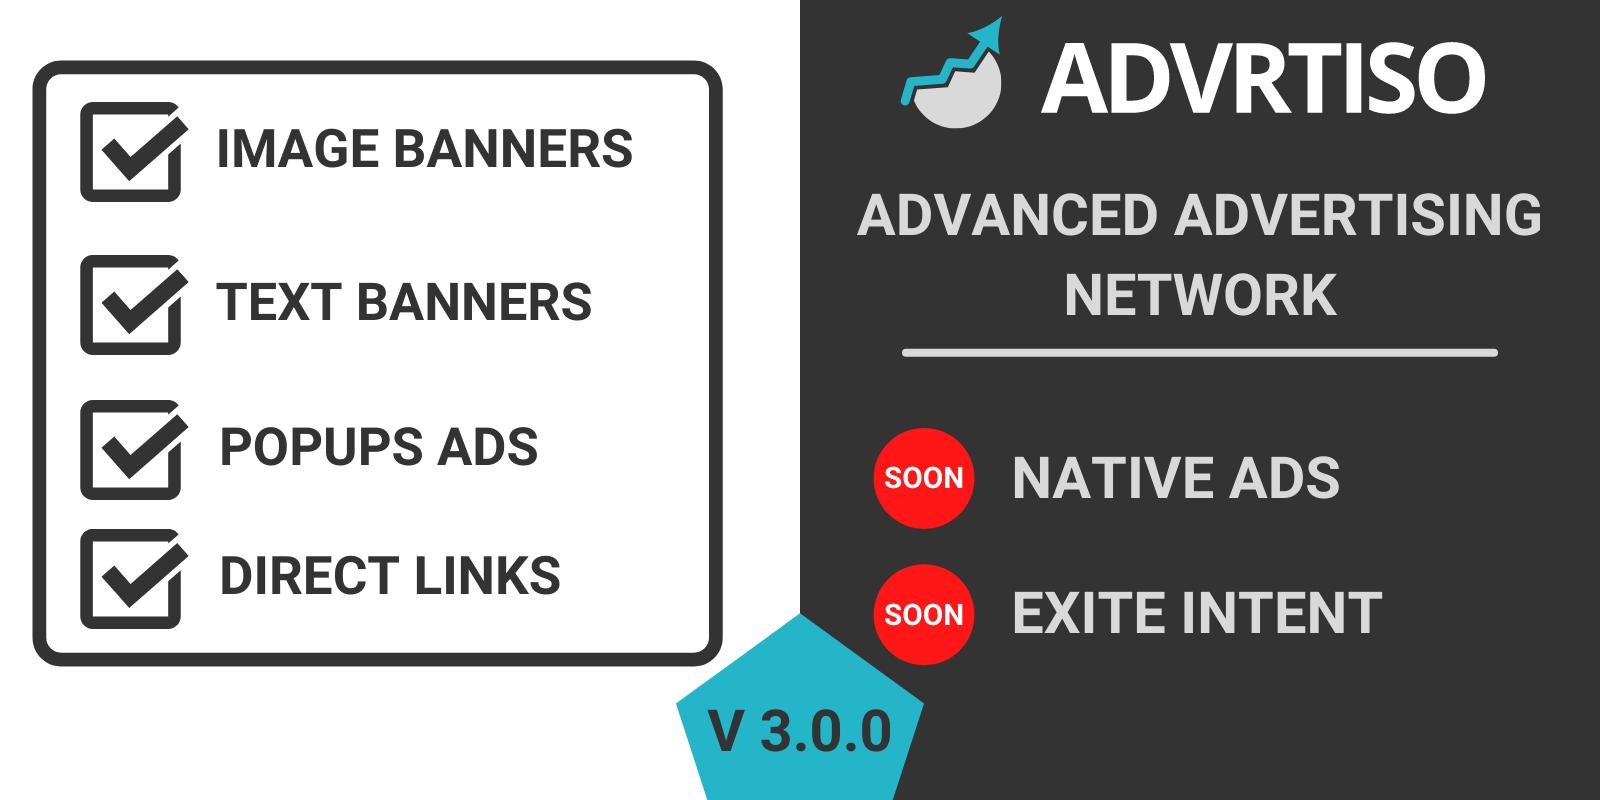 I will develop a custom advertising network website